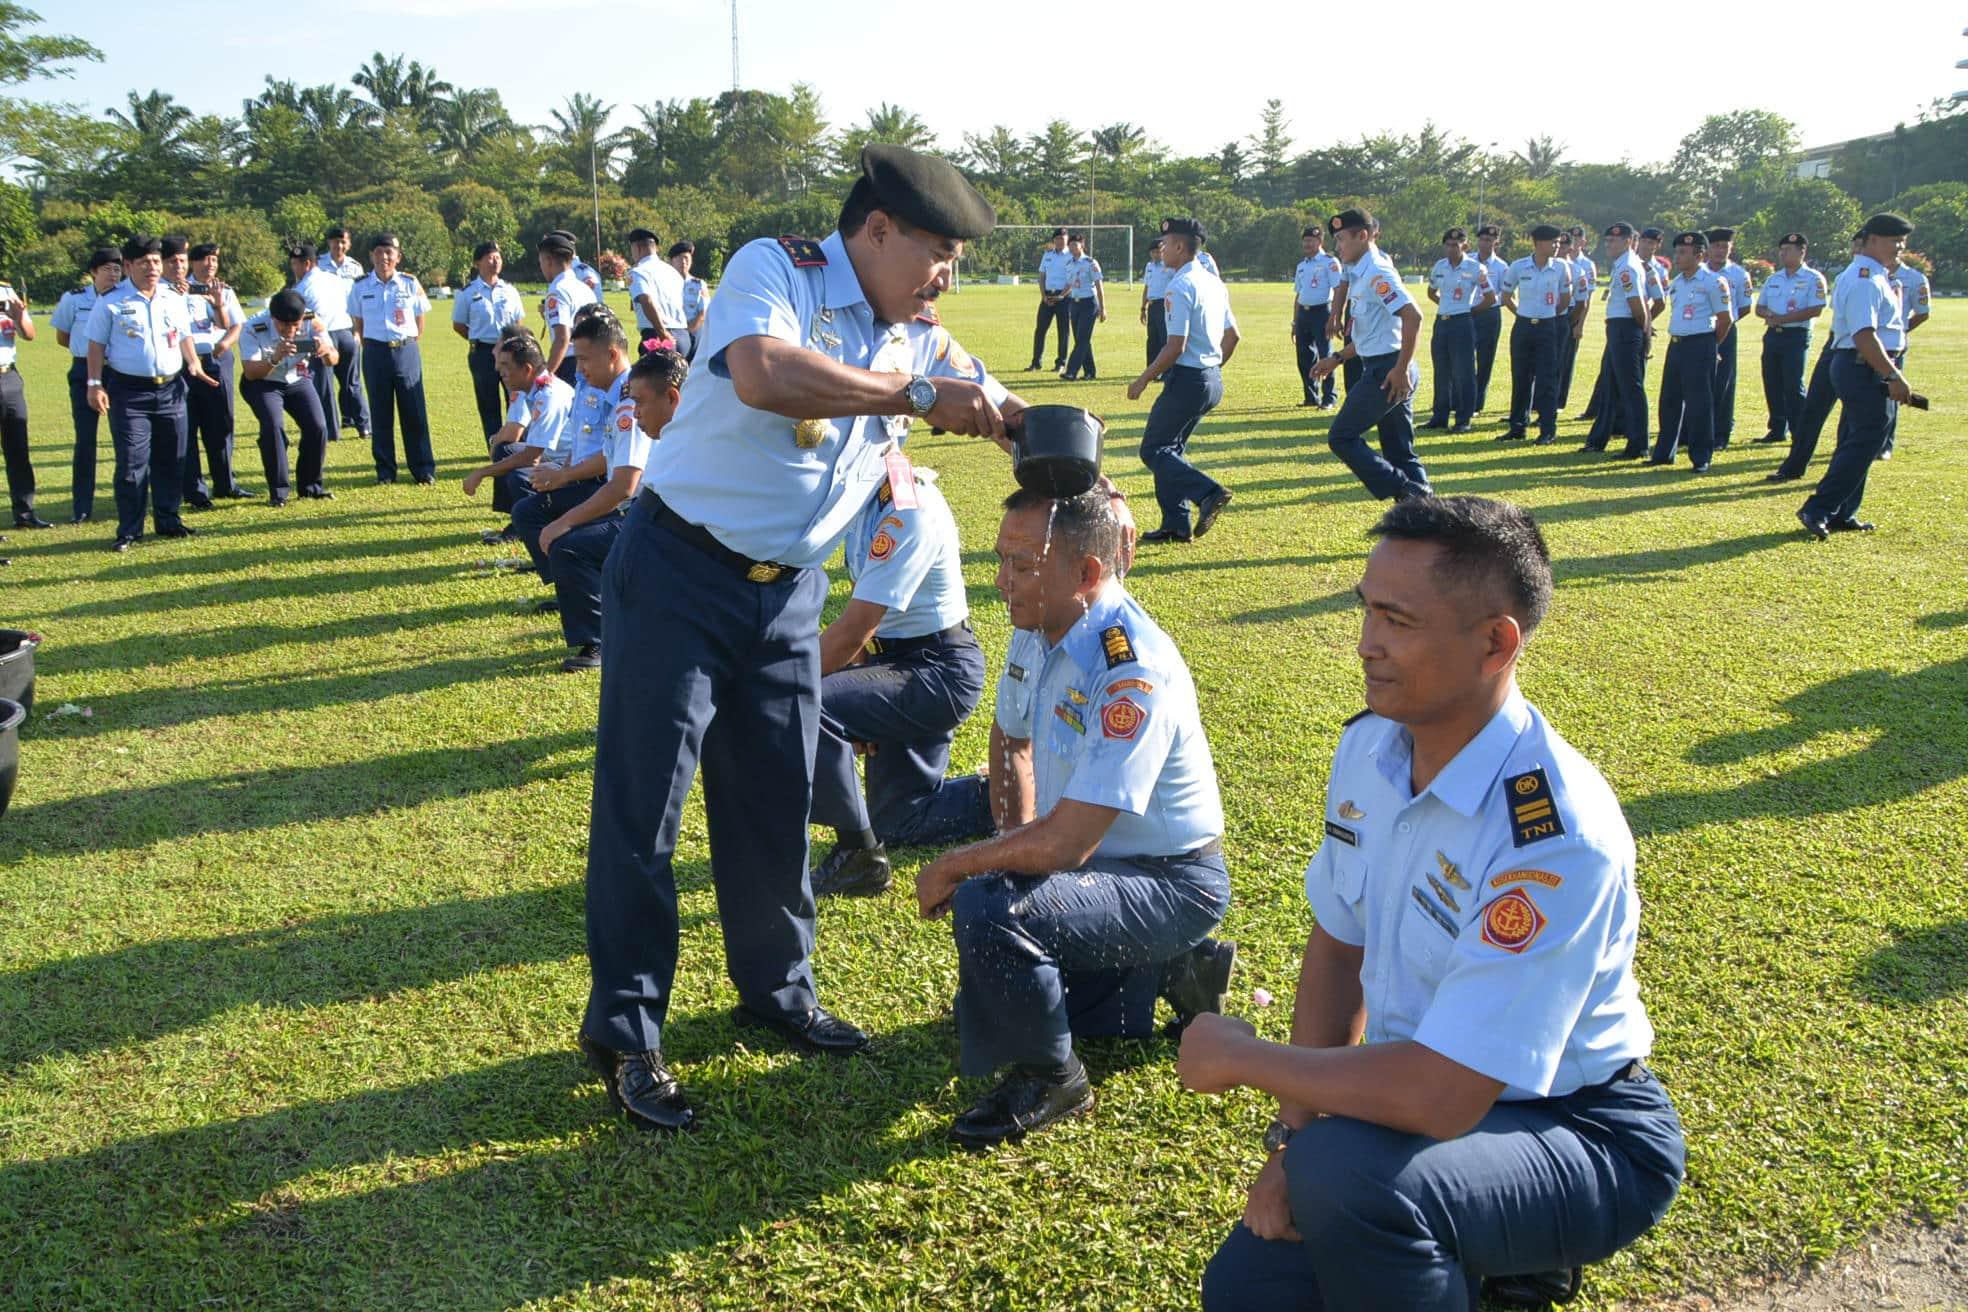 Personel Kosekhanudnas III Mendapat Kenaikan Pangkat Setingkat Lebih Tinggi